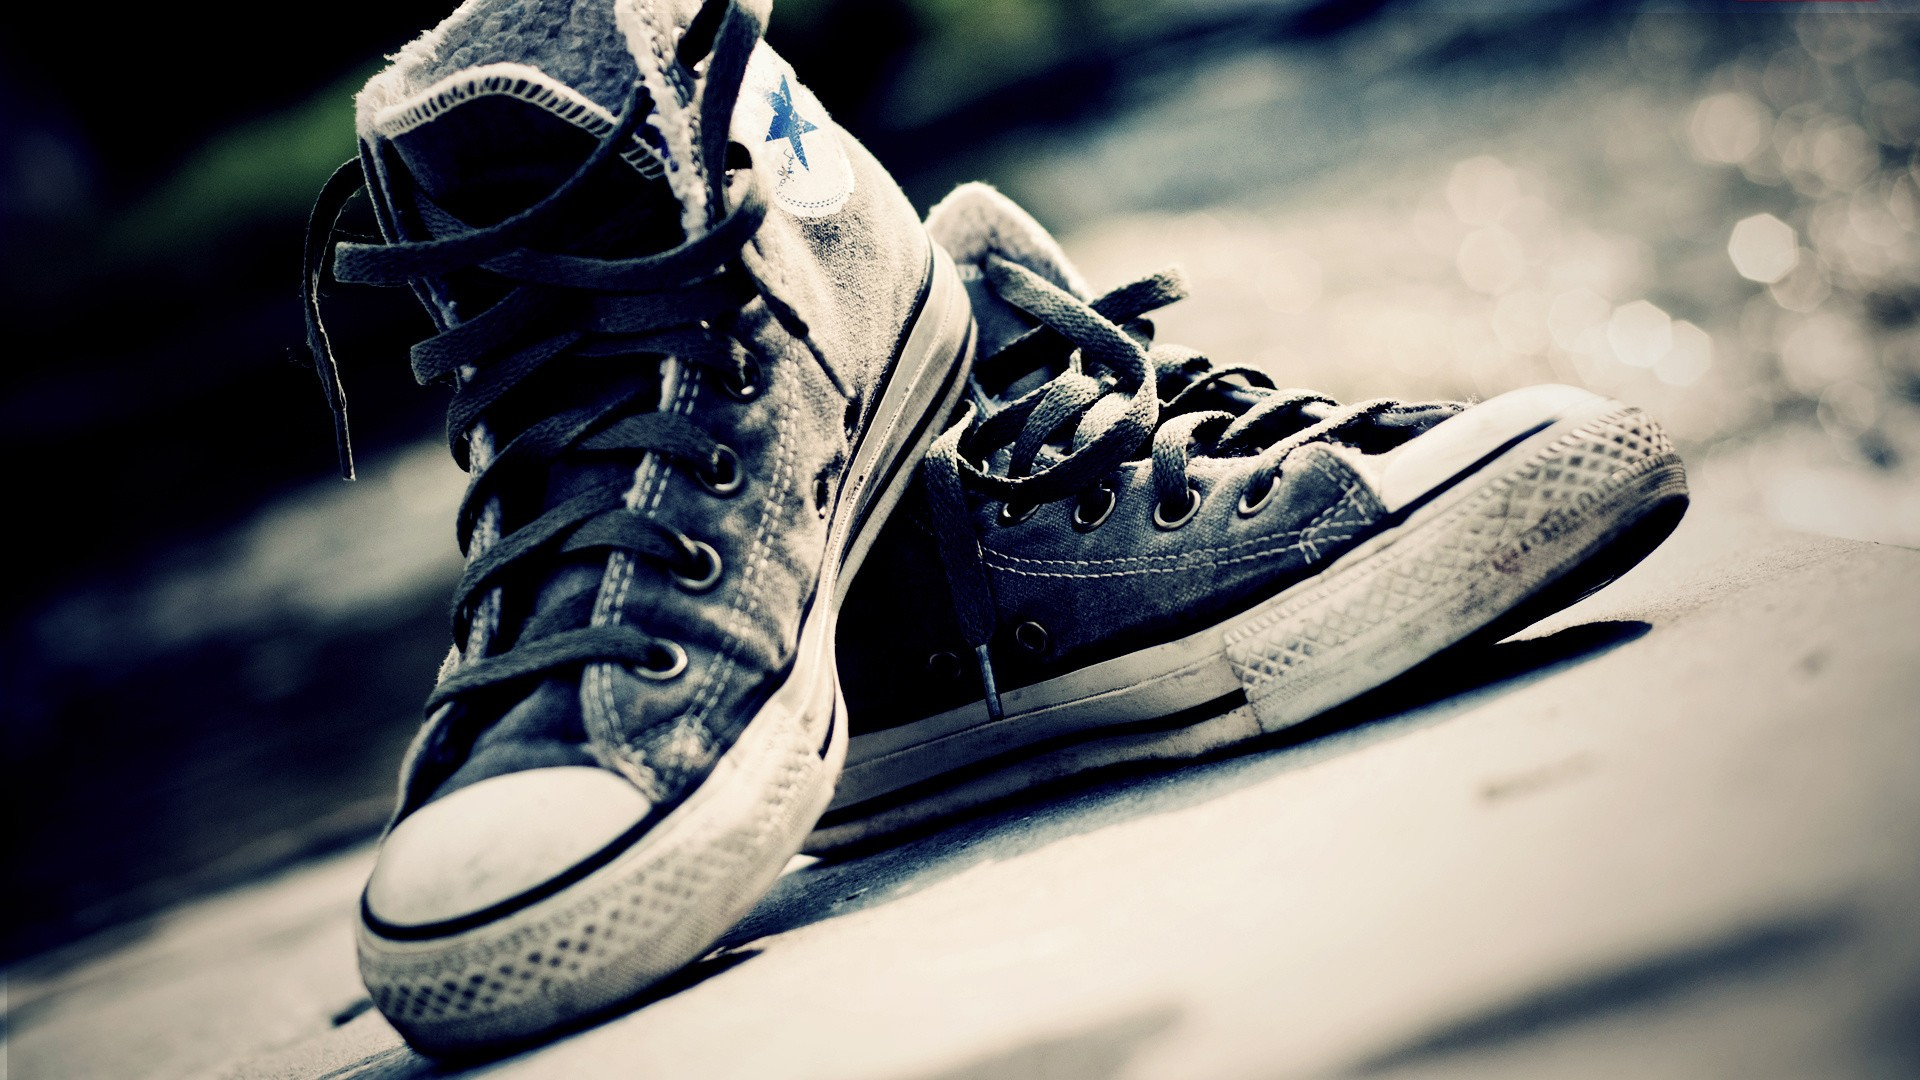 Shoes Wallpaper